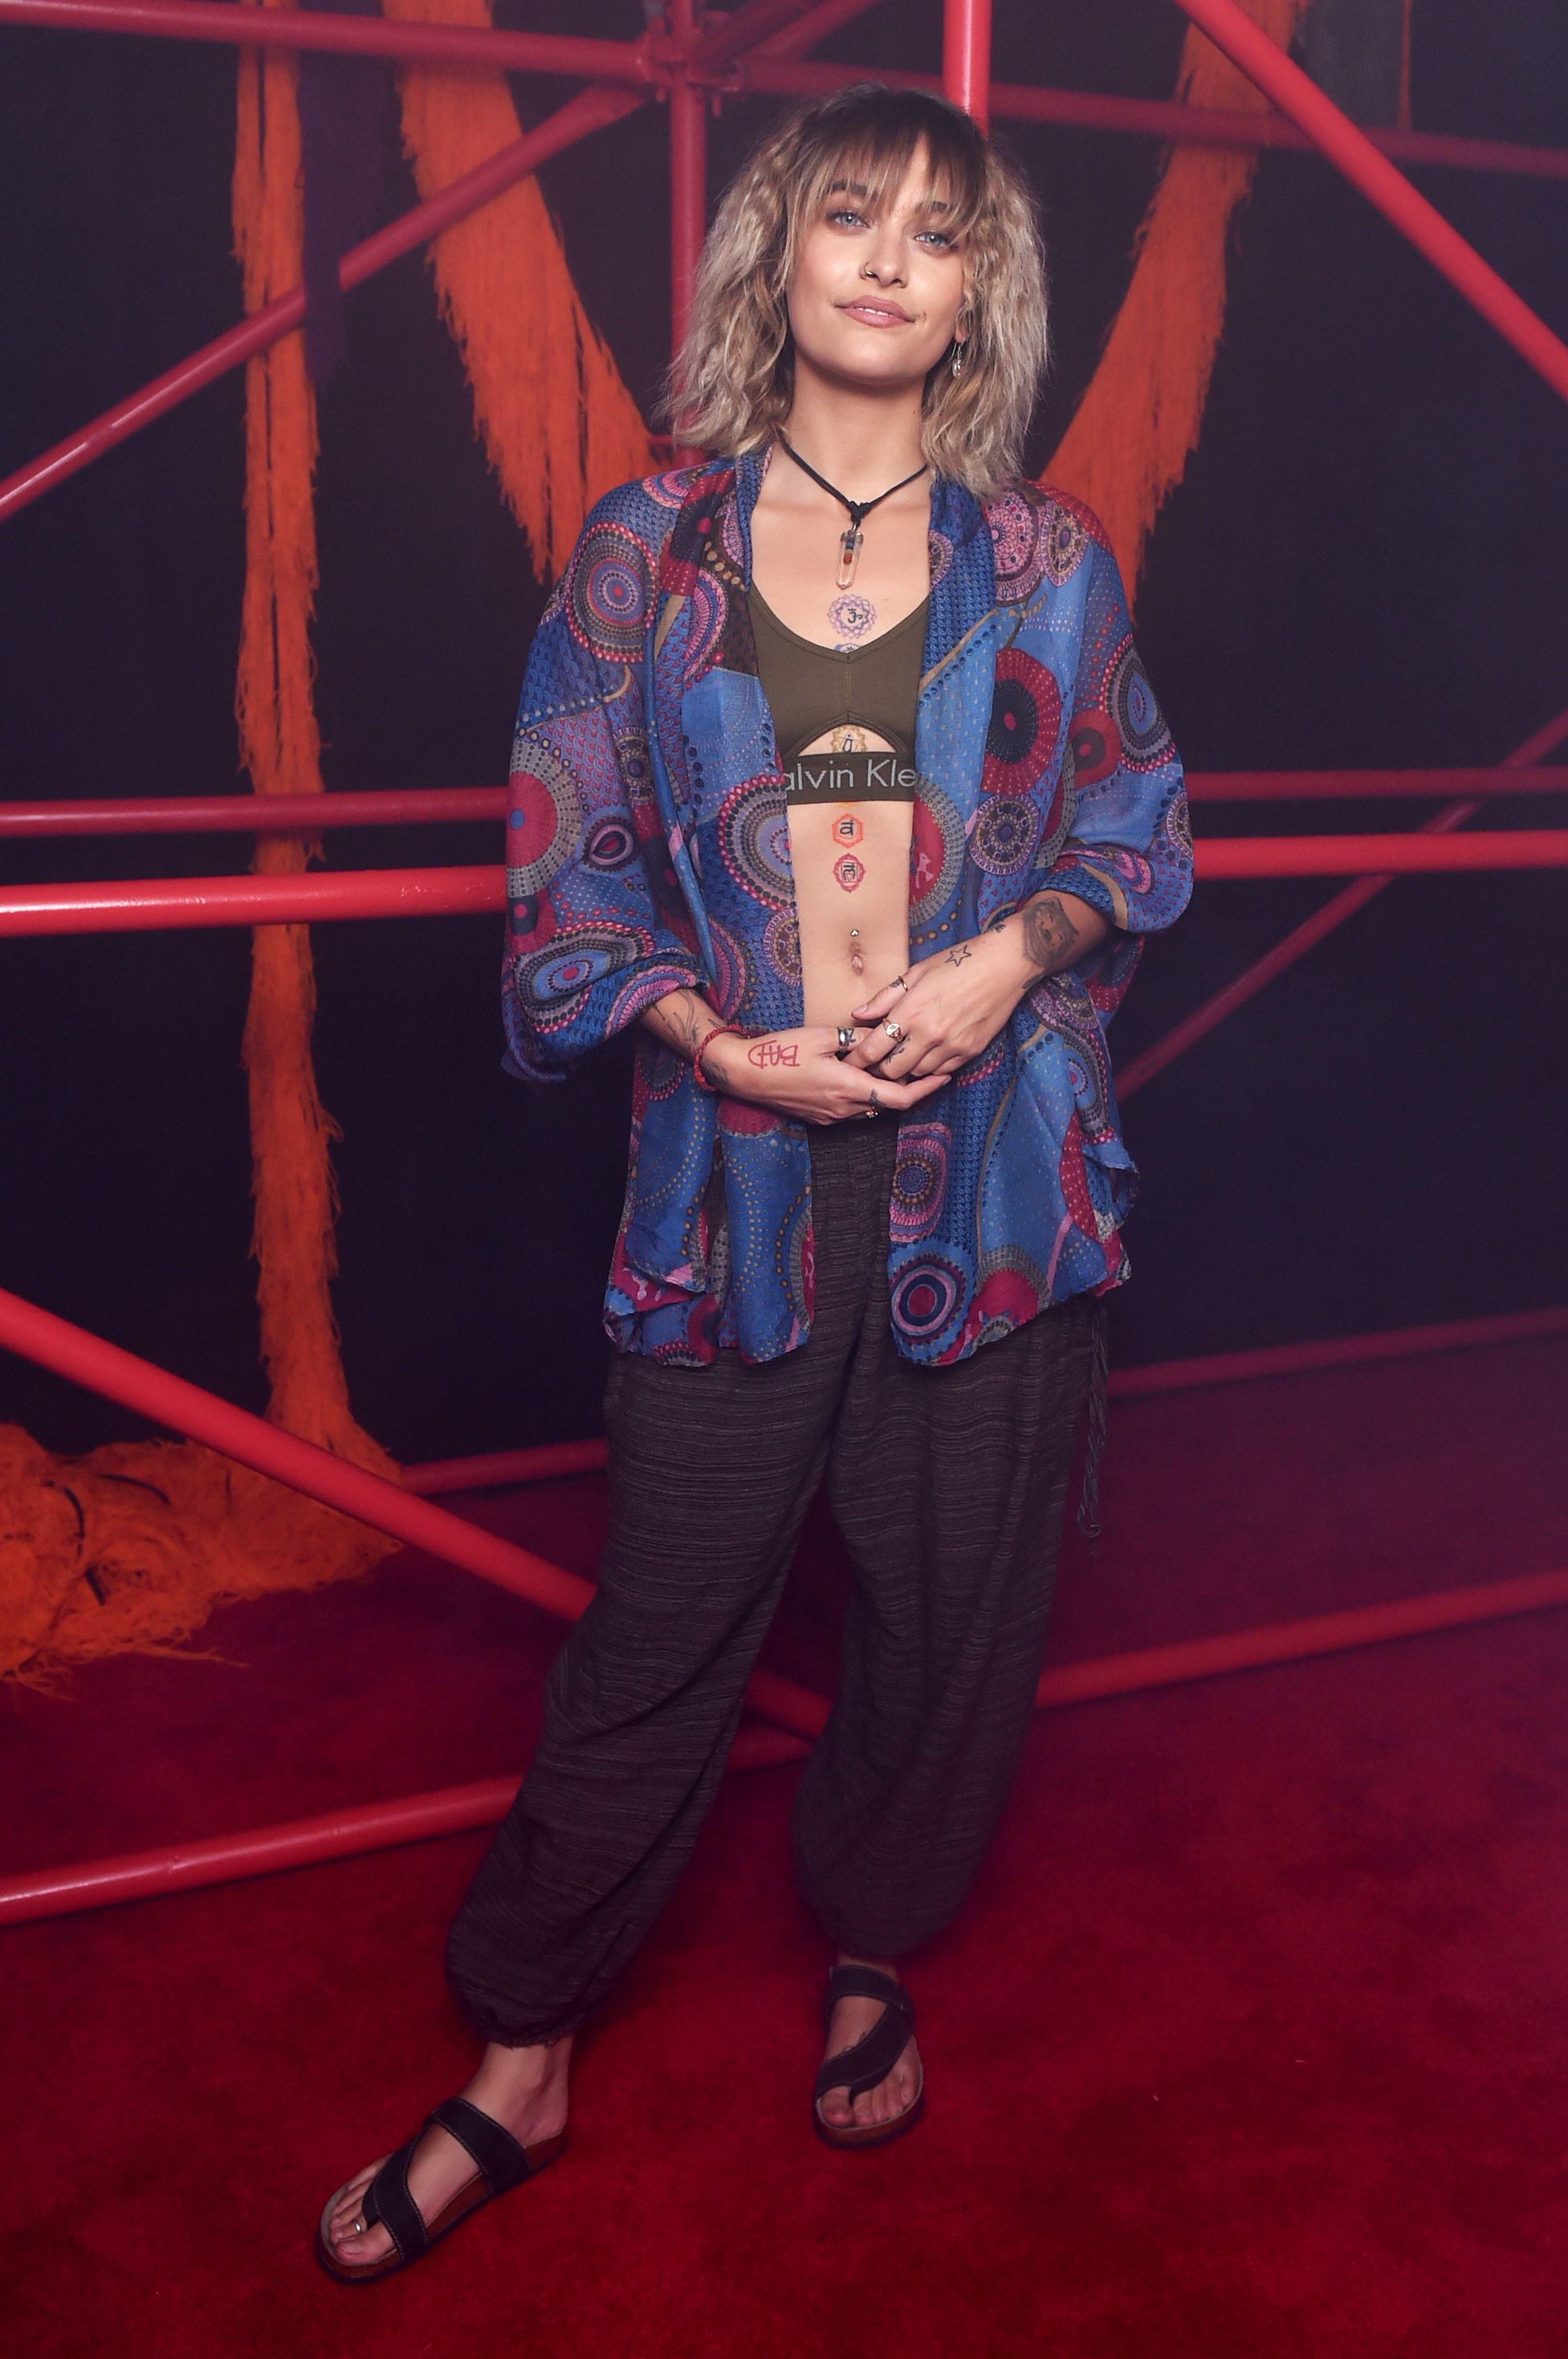 Paris JacksonCalvin Klein show, After Party, Spring Summer 2018, New York Fashion Week, USA - 08 Sep 2017